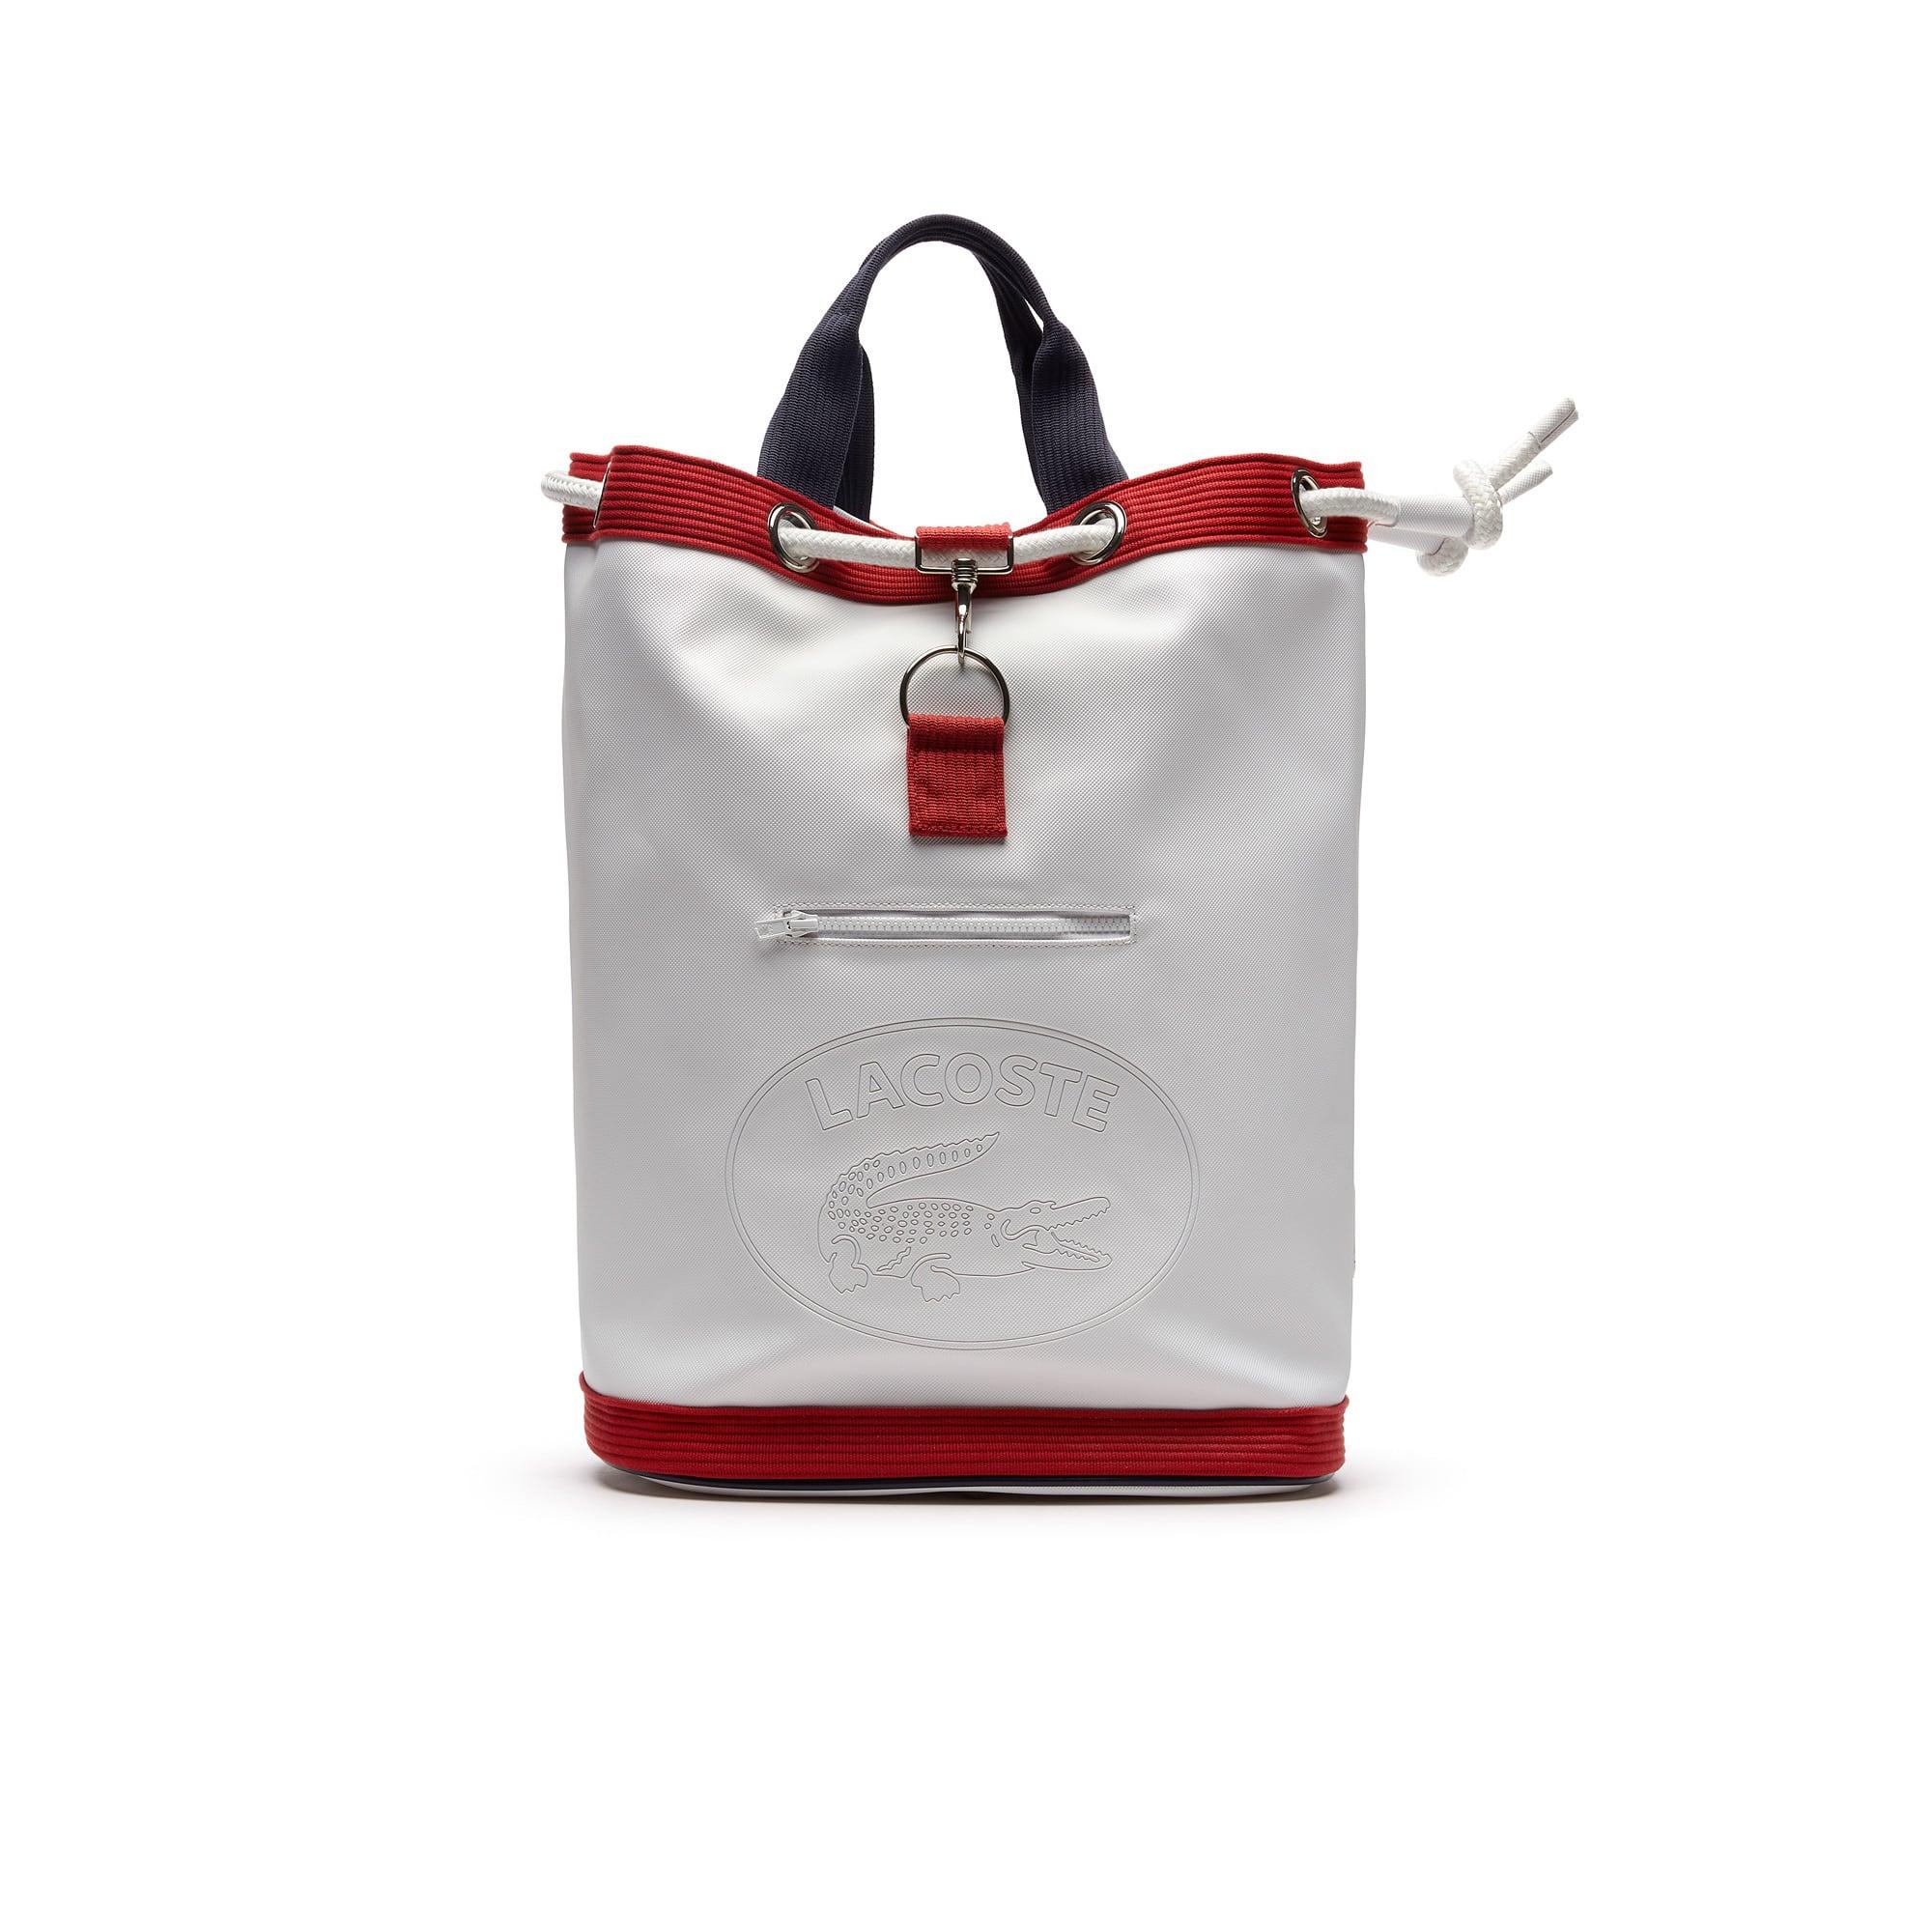 Men's Limited Edition 85th Anniversary Petit Piqué Nautical Bag